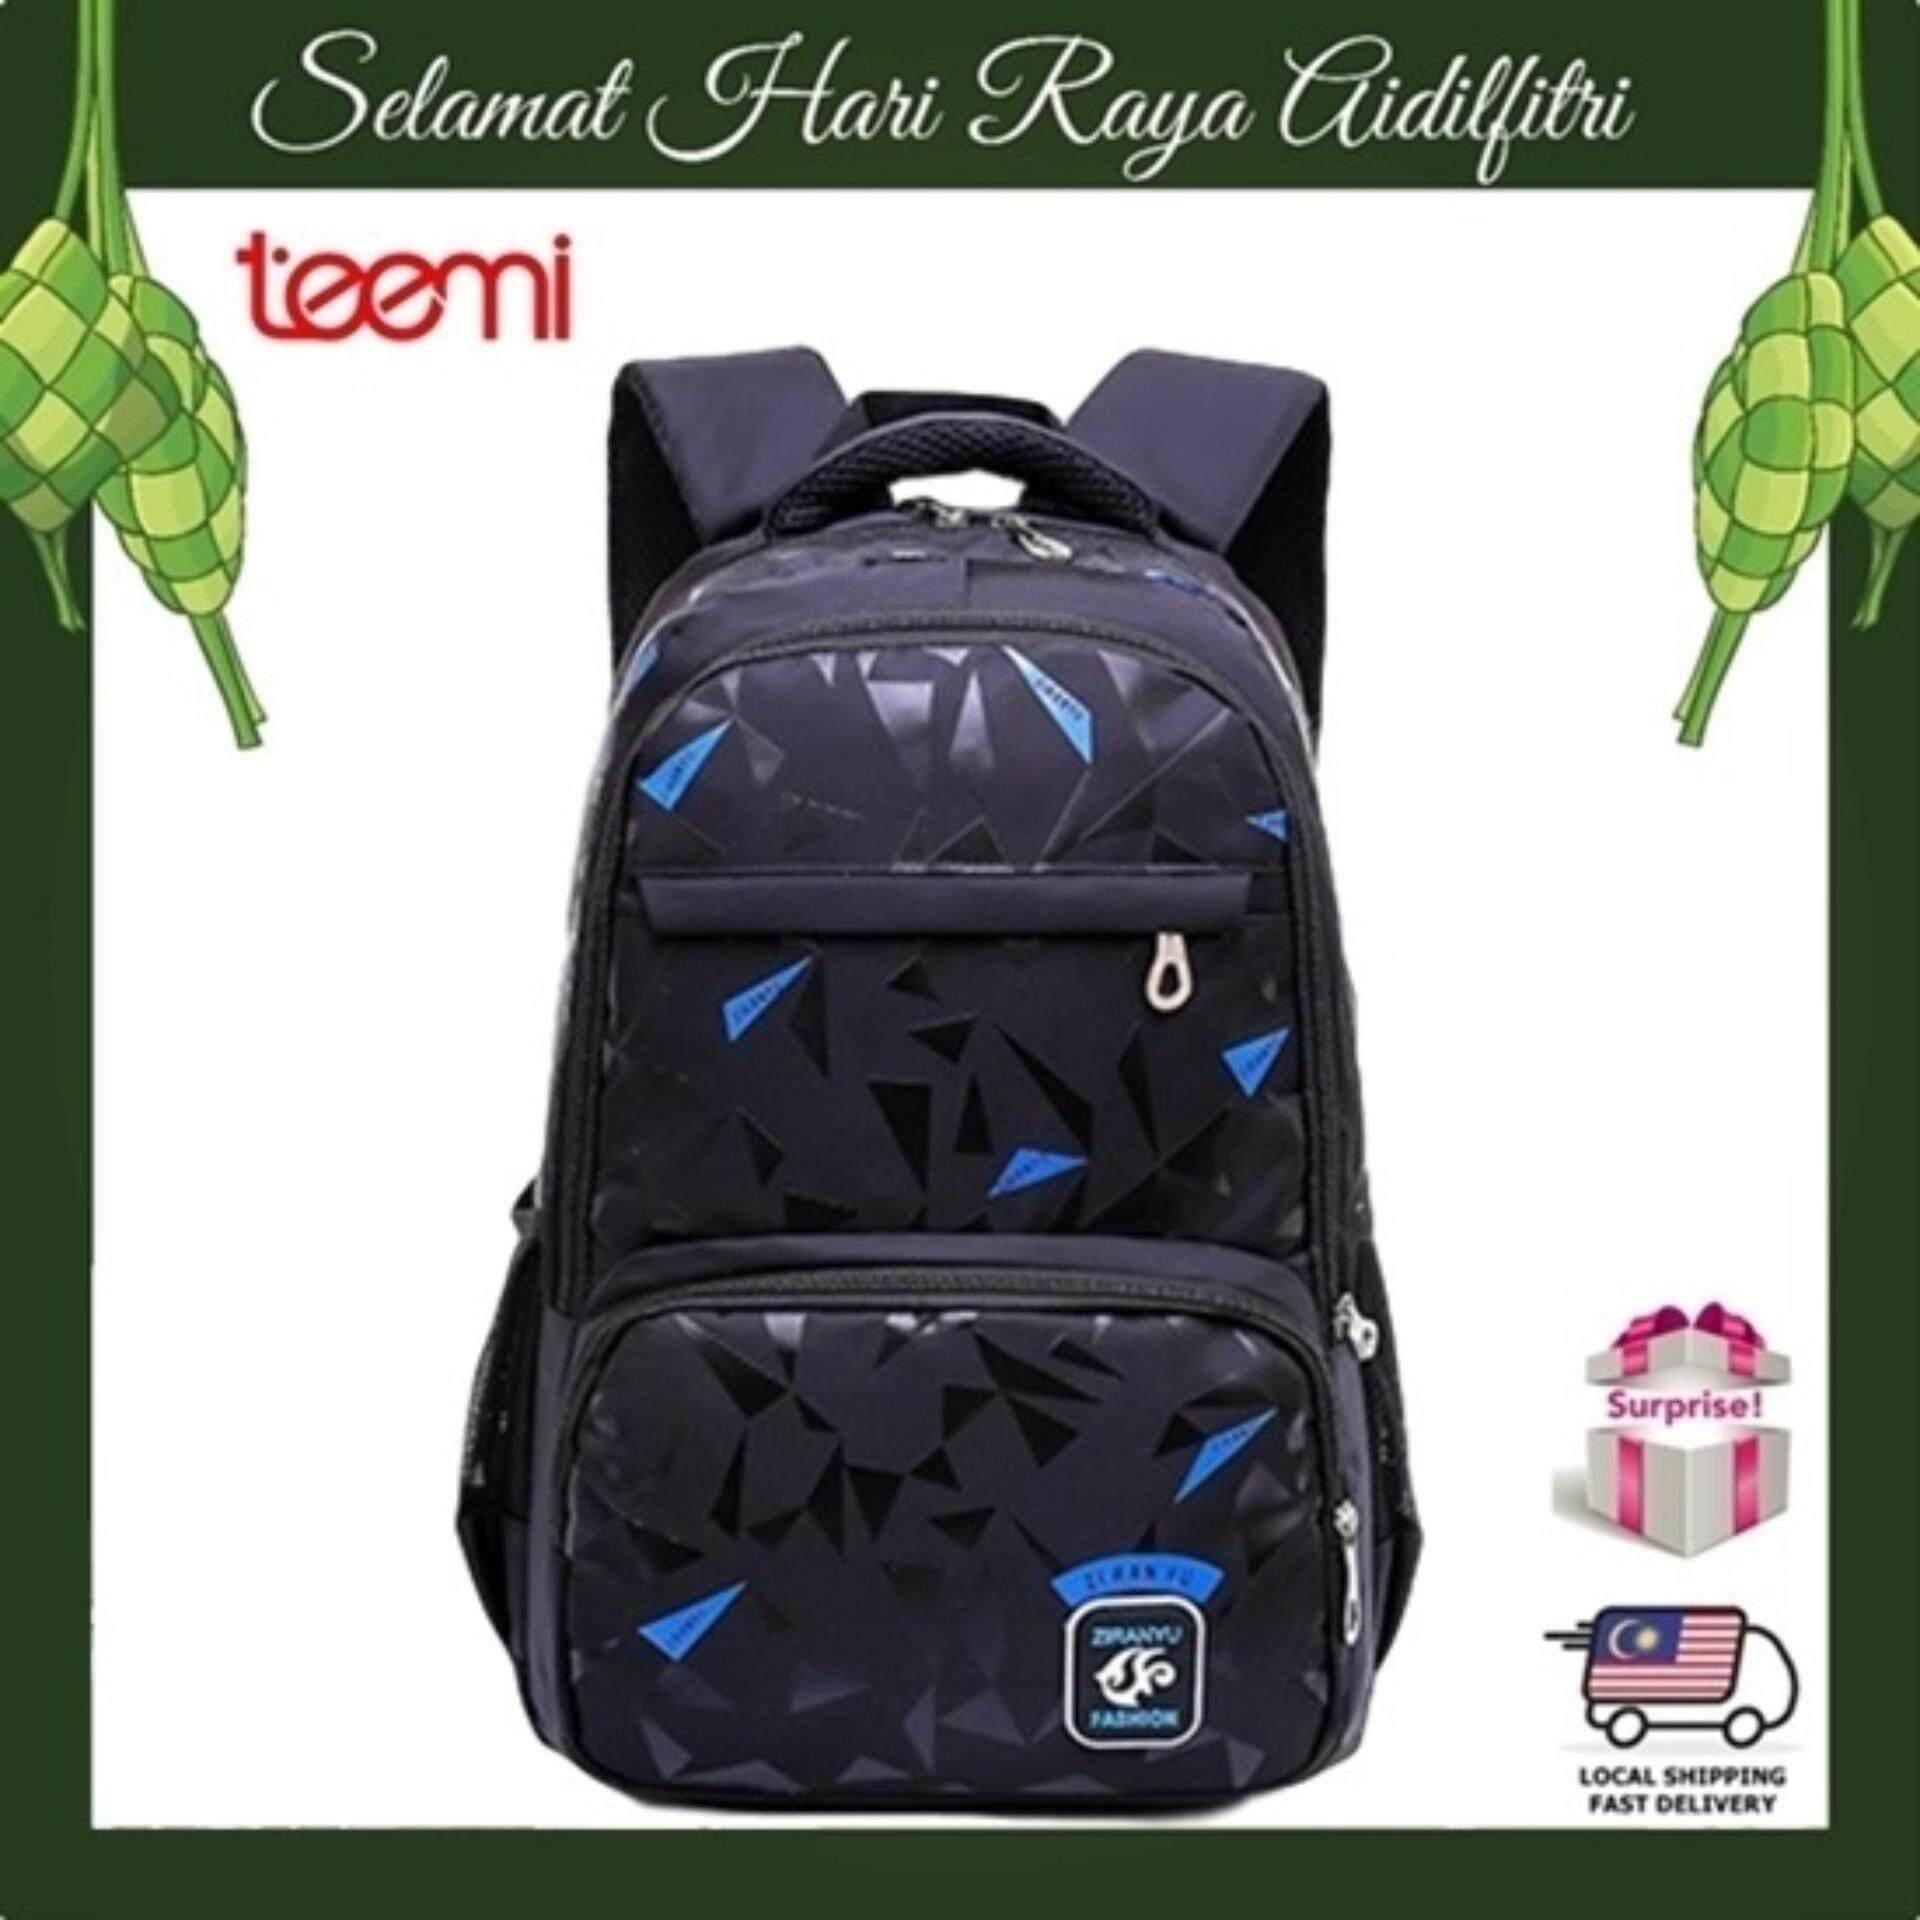 TEEMI Geometric Snow Flakes Highlight Printing Unisex Nylon Backpack Leisure Casual Teen College School Travel Laptop Bag